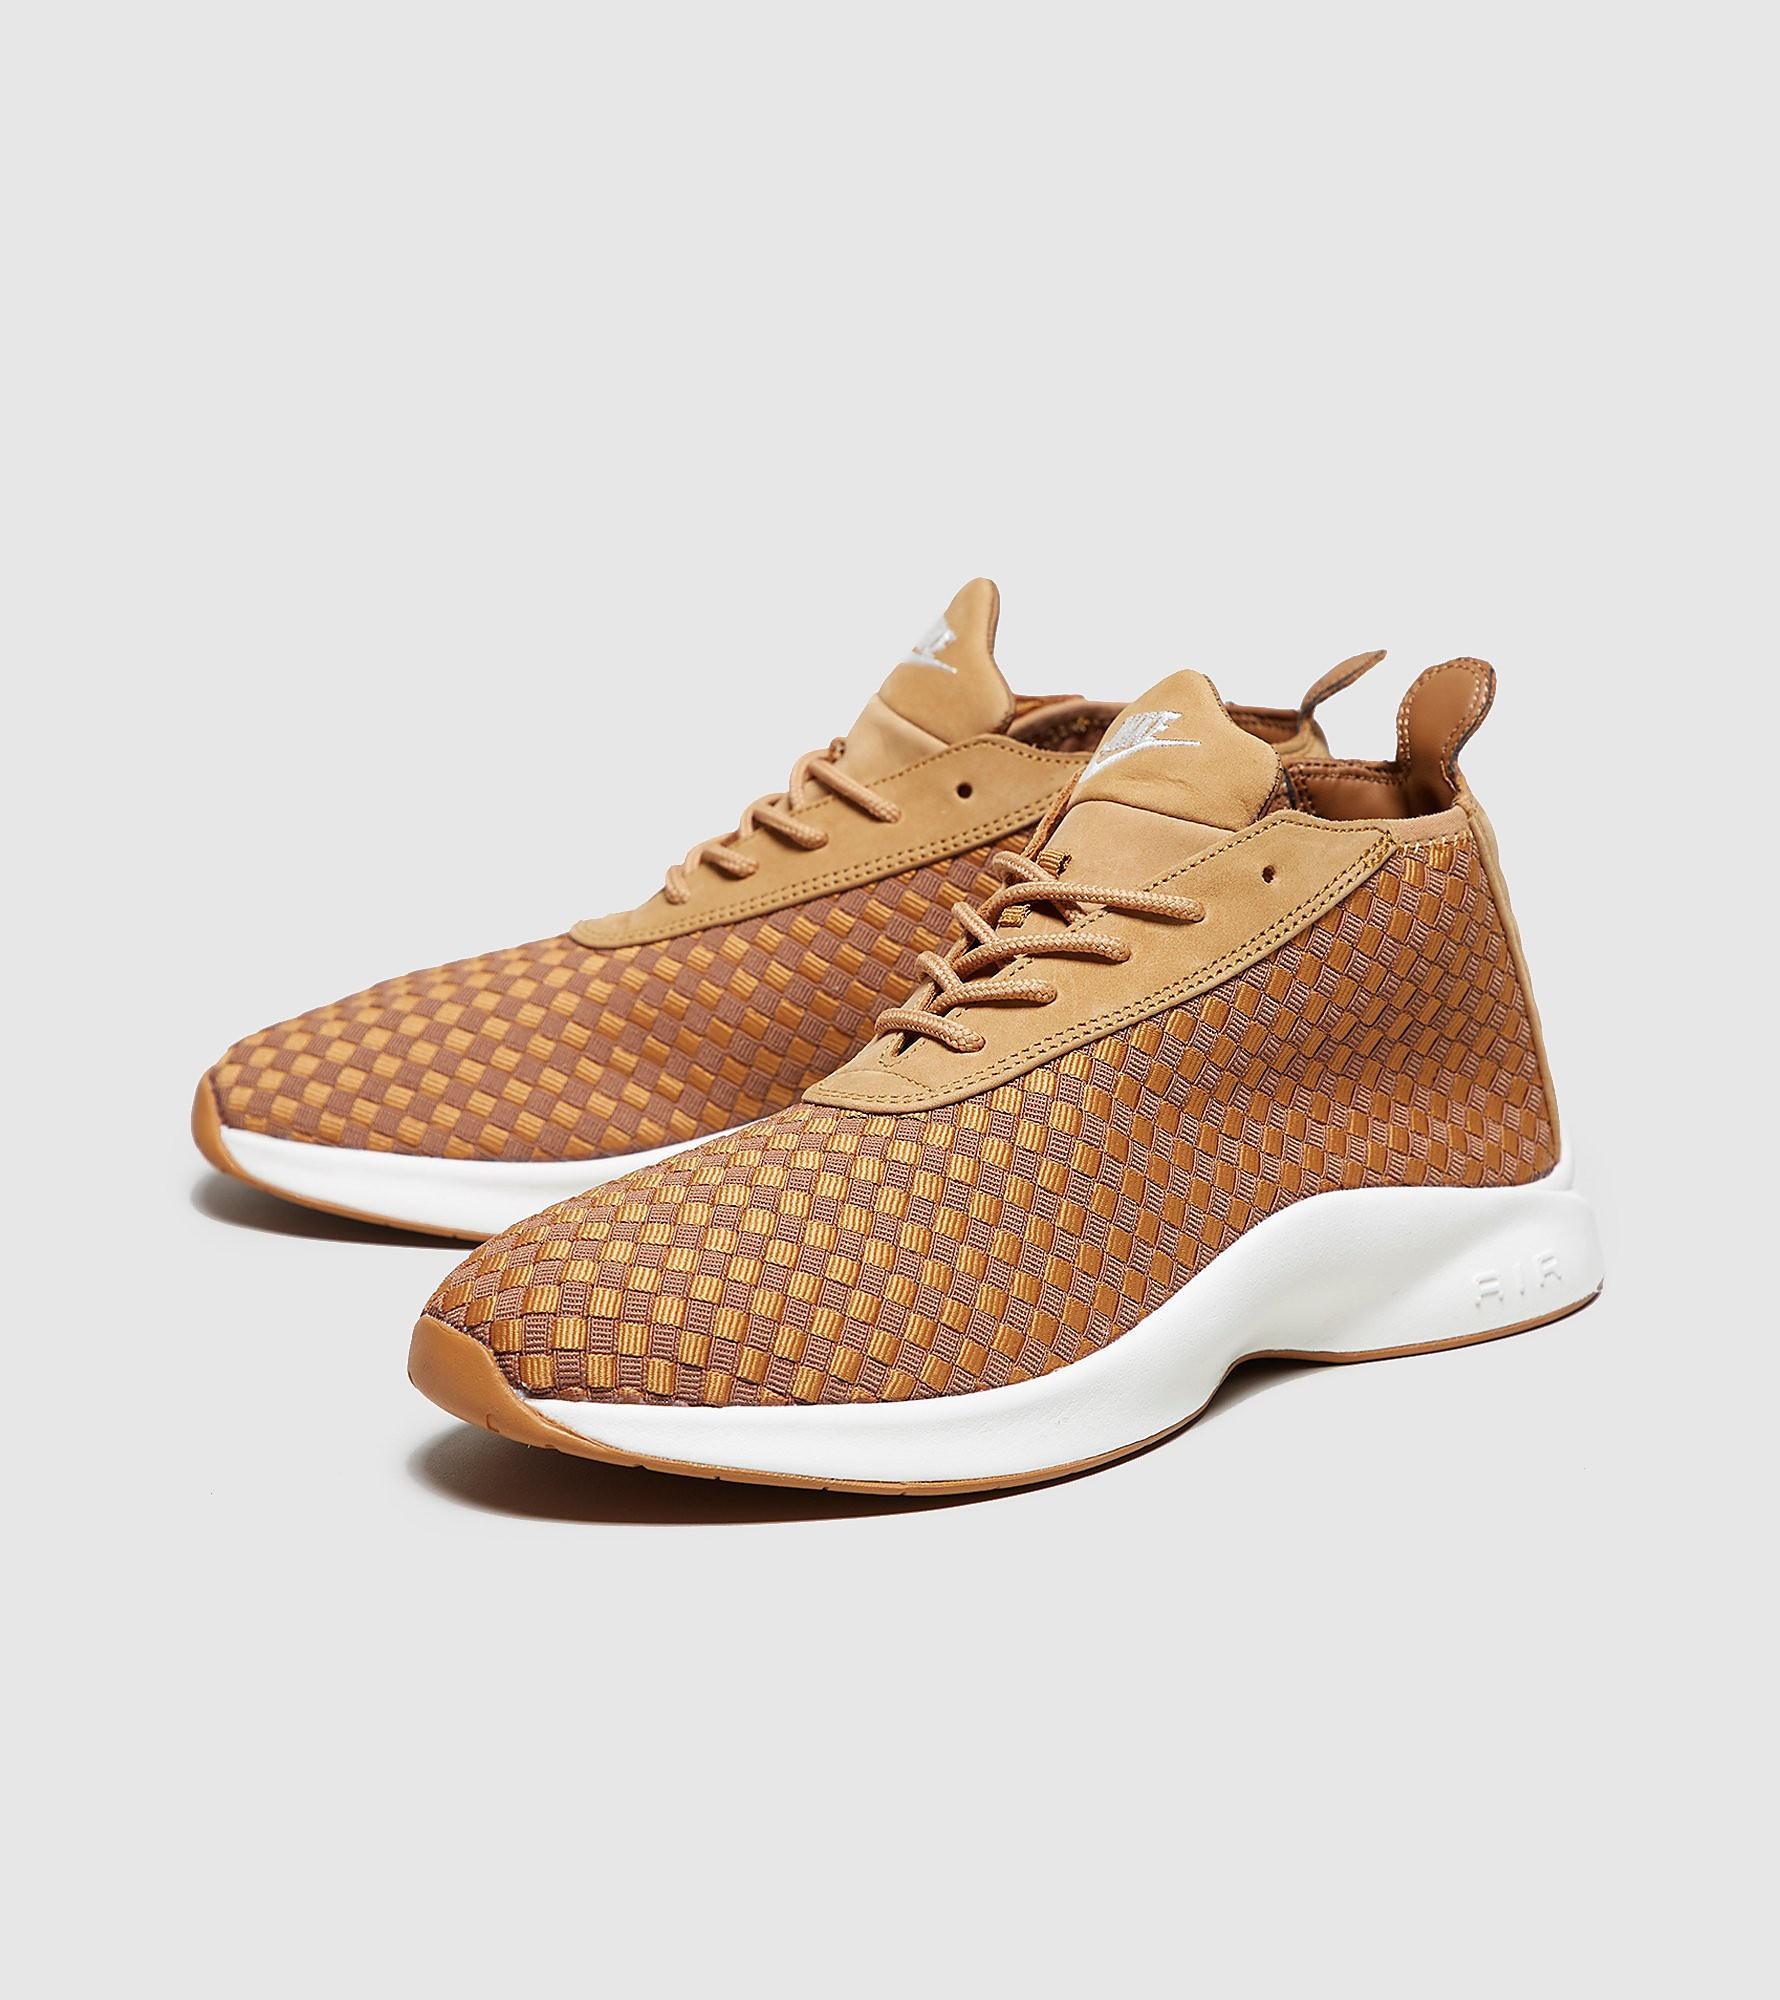 Nike Air Woven Boot Flax